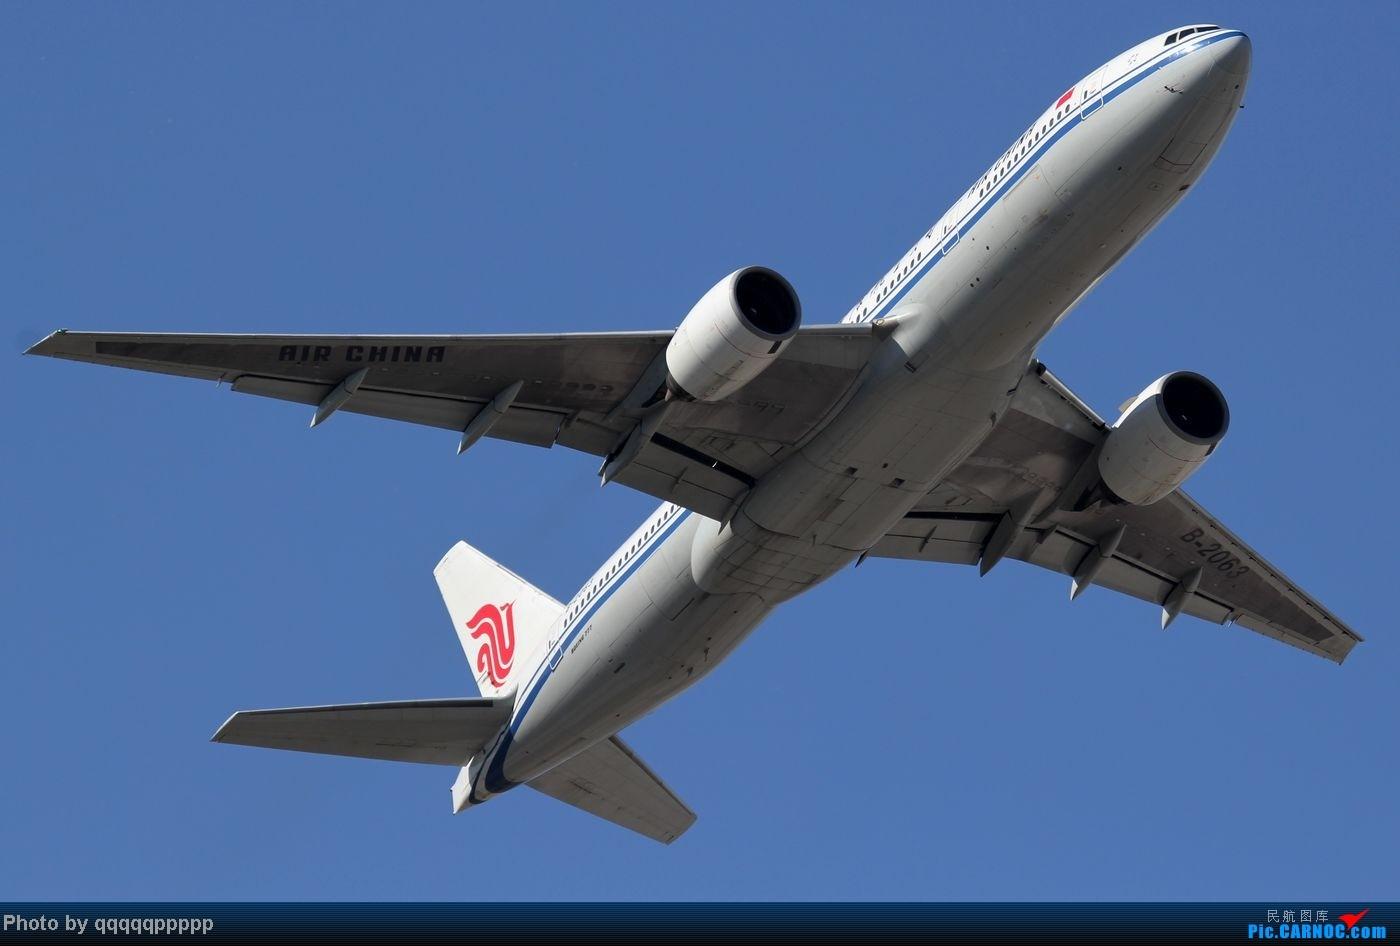 Re:[原创]五一小假期~北京迎来春暖花开的好天气。岂能错过这个拍机的好机会~ BOEING 777-200 B-2063 中国北京首都机场